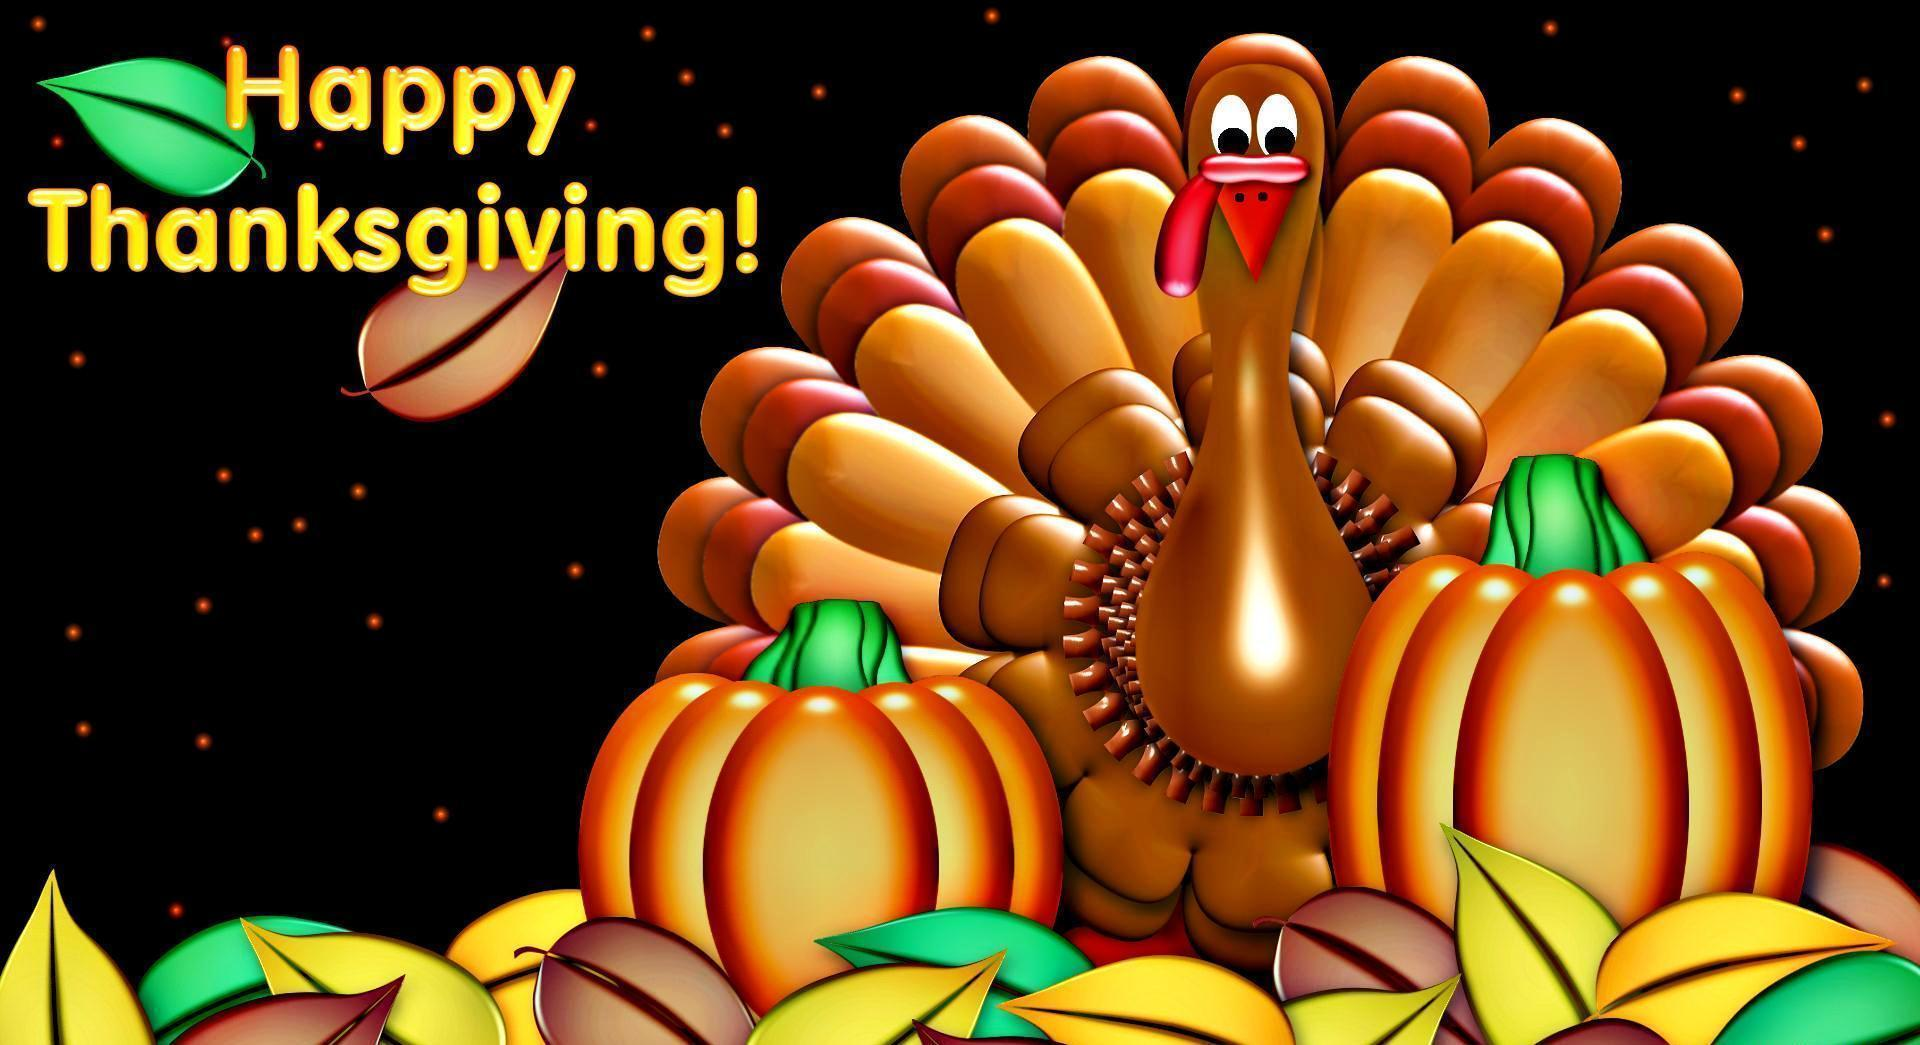 Free Thanksgiving Screensavers Wallpapers - Wallpaper Cave